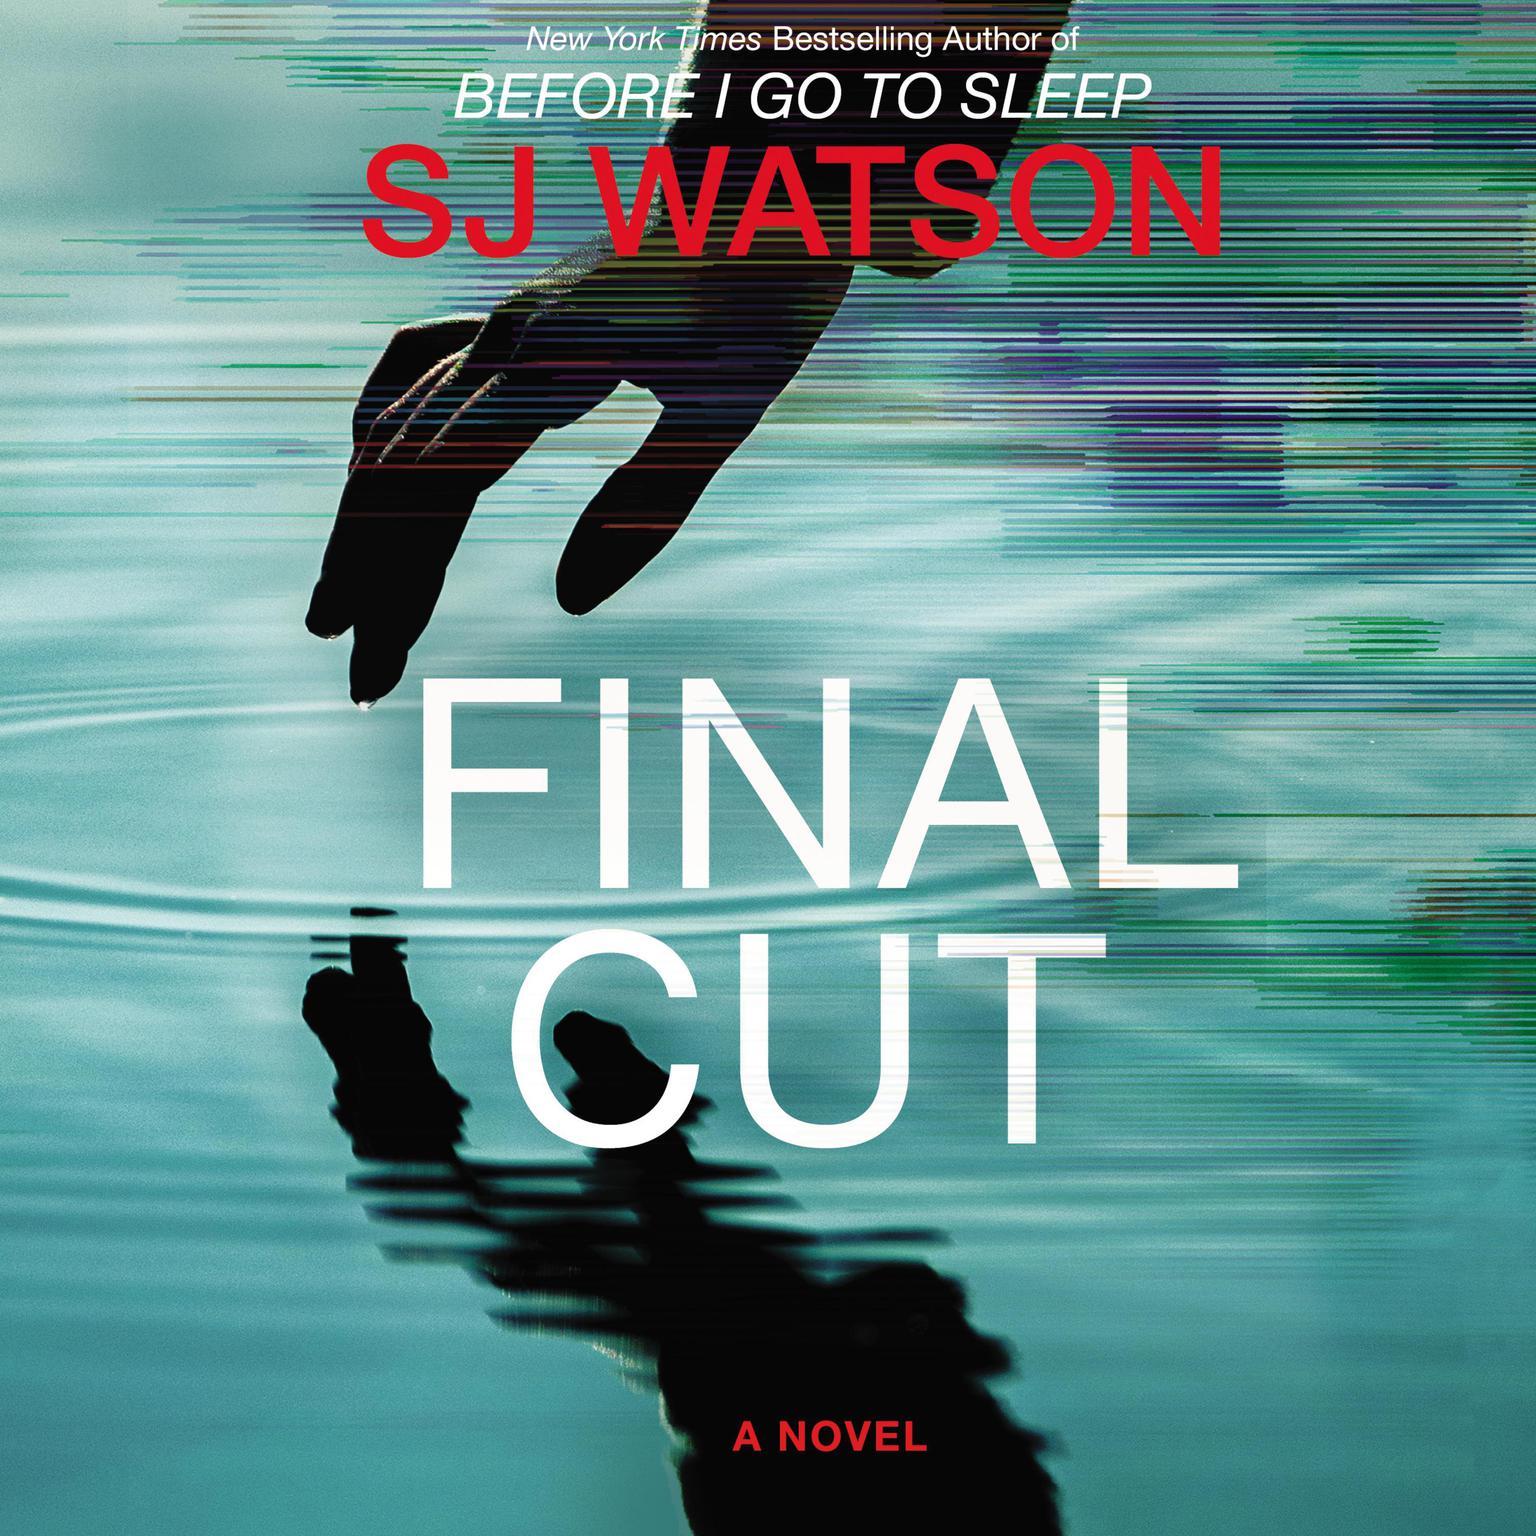 Final Cut: A Novel Audiobook, by S. J. Watson